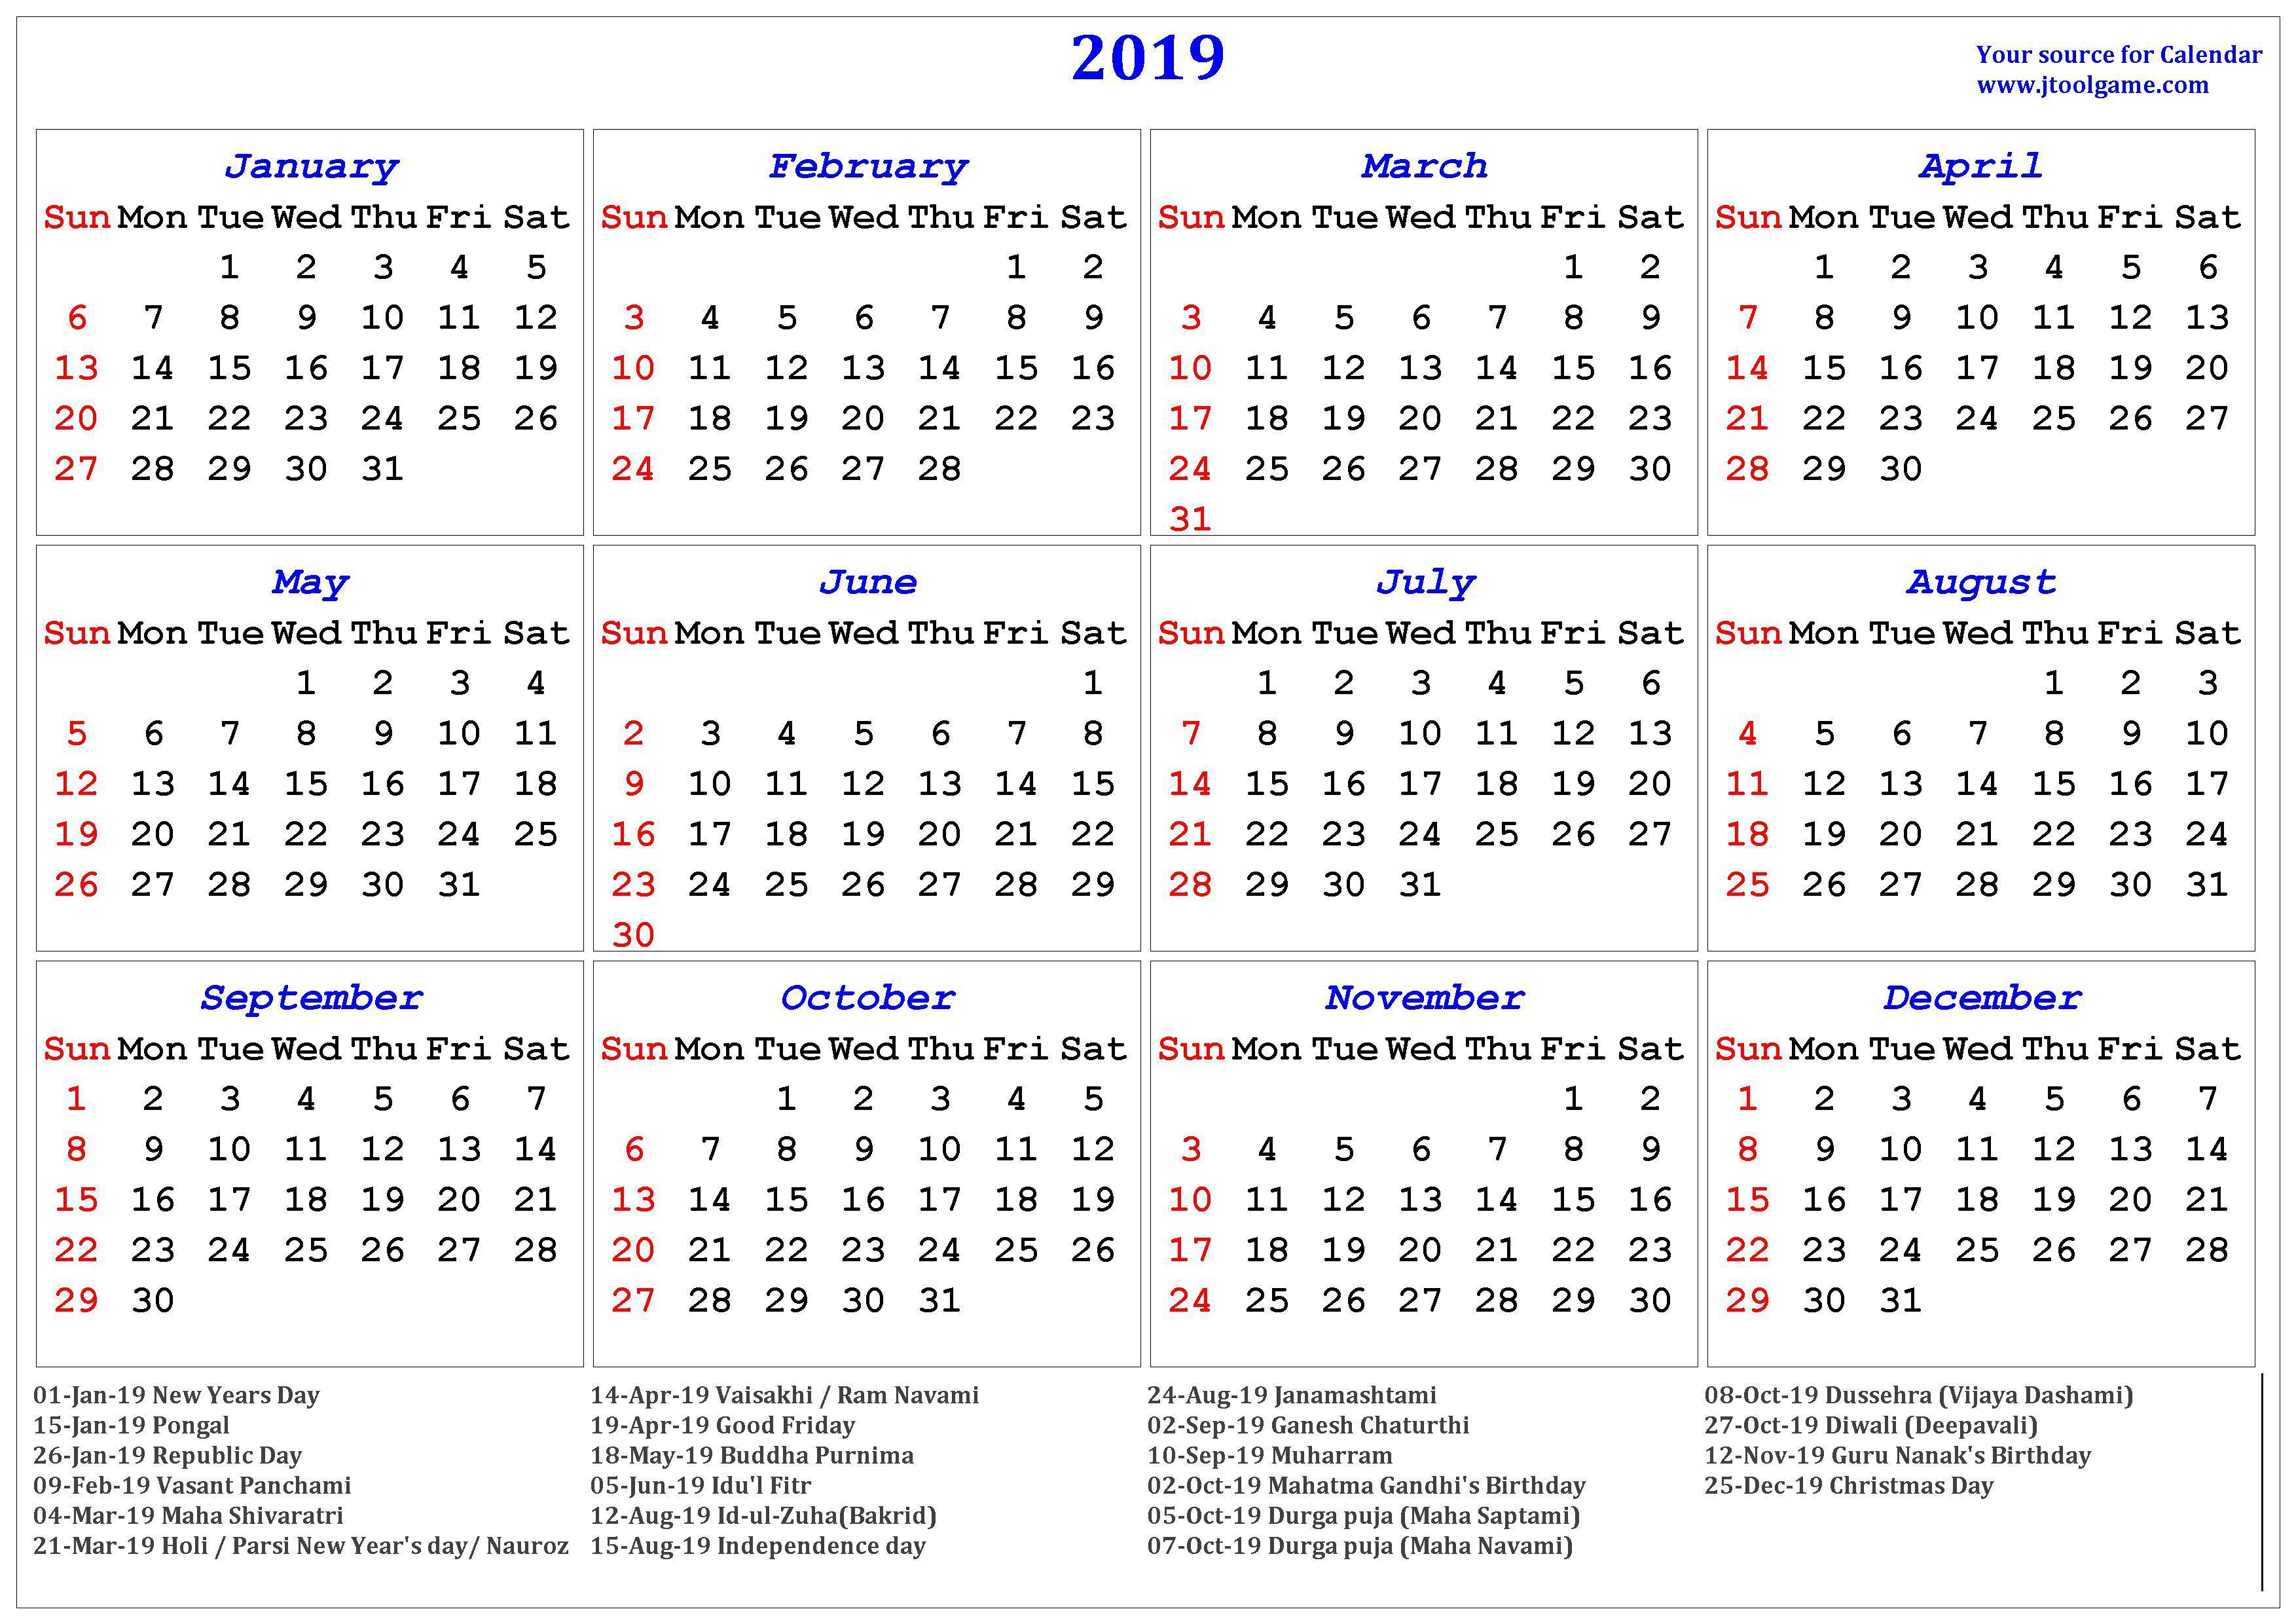 2019 Hindu Calendar With Tithi | Tyohar, Holidays, Festivals throughout Catholic Calander For October 2019